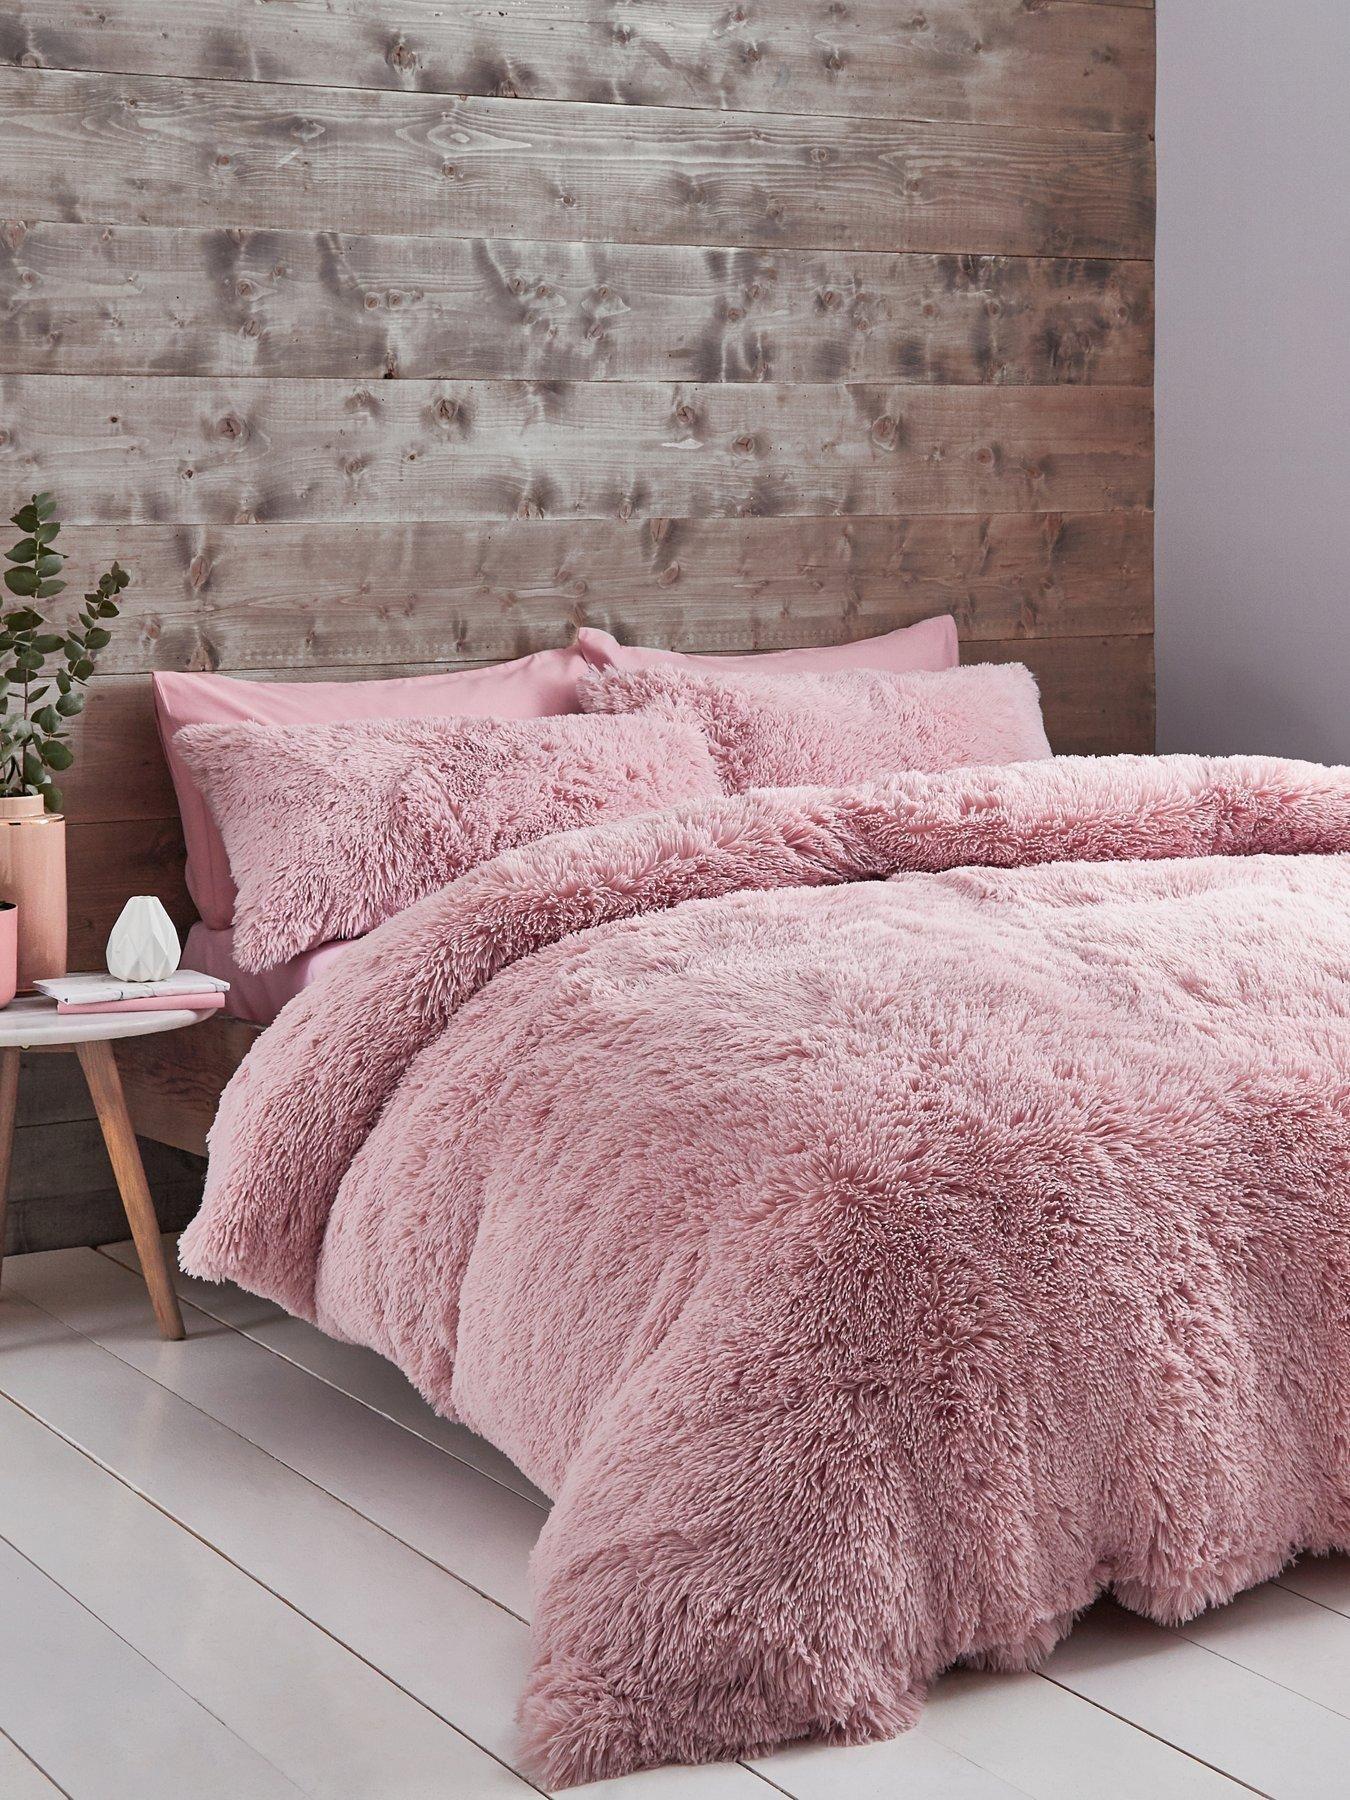 Catherine Lansfield Cuddly Faux Fur Duvet Cover Set In Blush Pink Duvet Cover Sets Duvet Covers Faux Fur Bedding